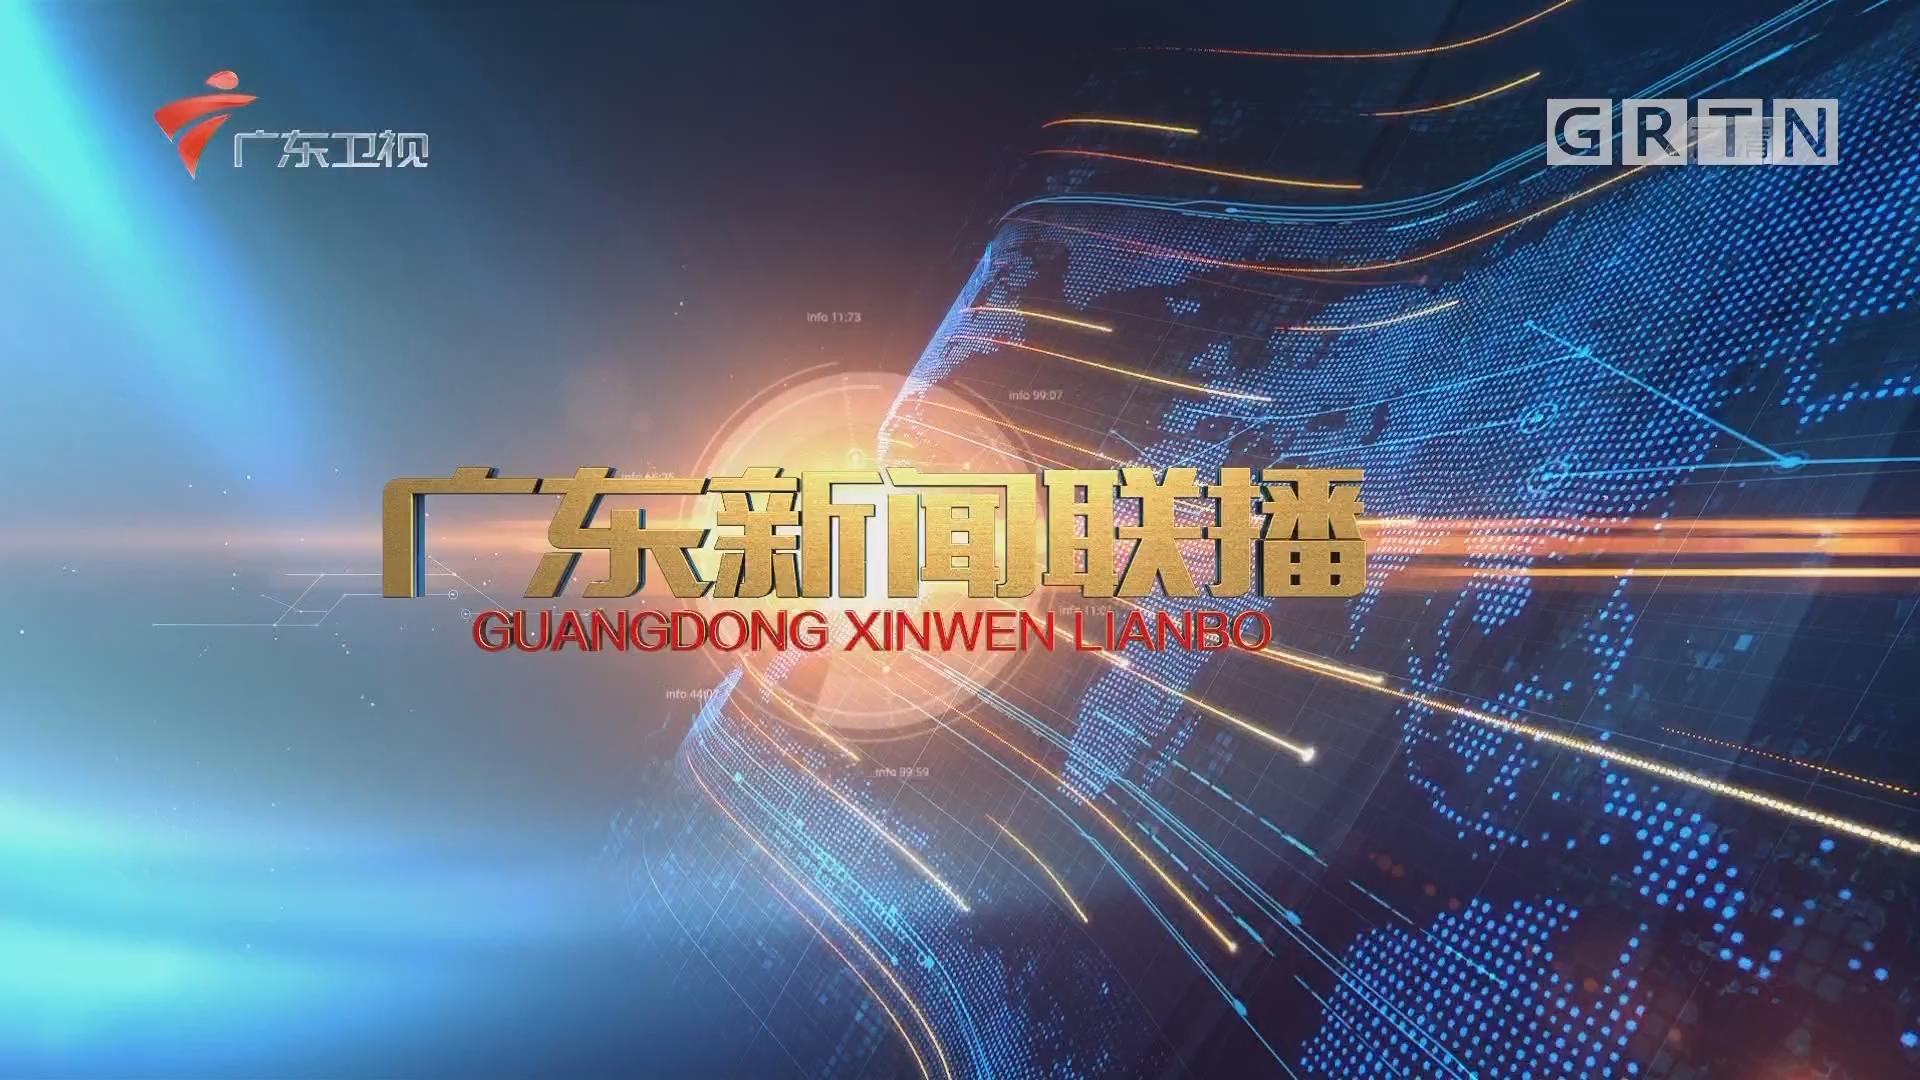 [HD][2019-04-05]广东新闻联播:横琴:打造国际休闲旅游岛 构建全域旅游发展新格局